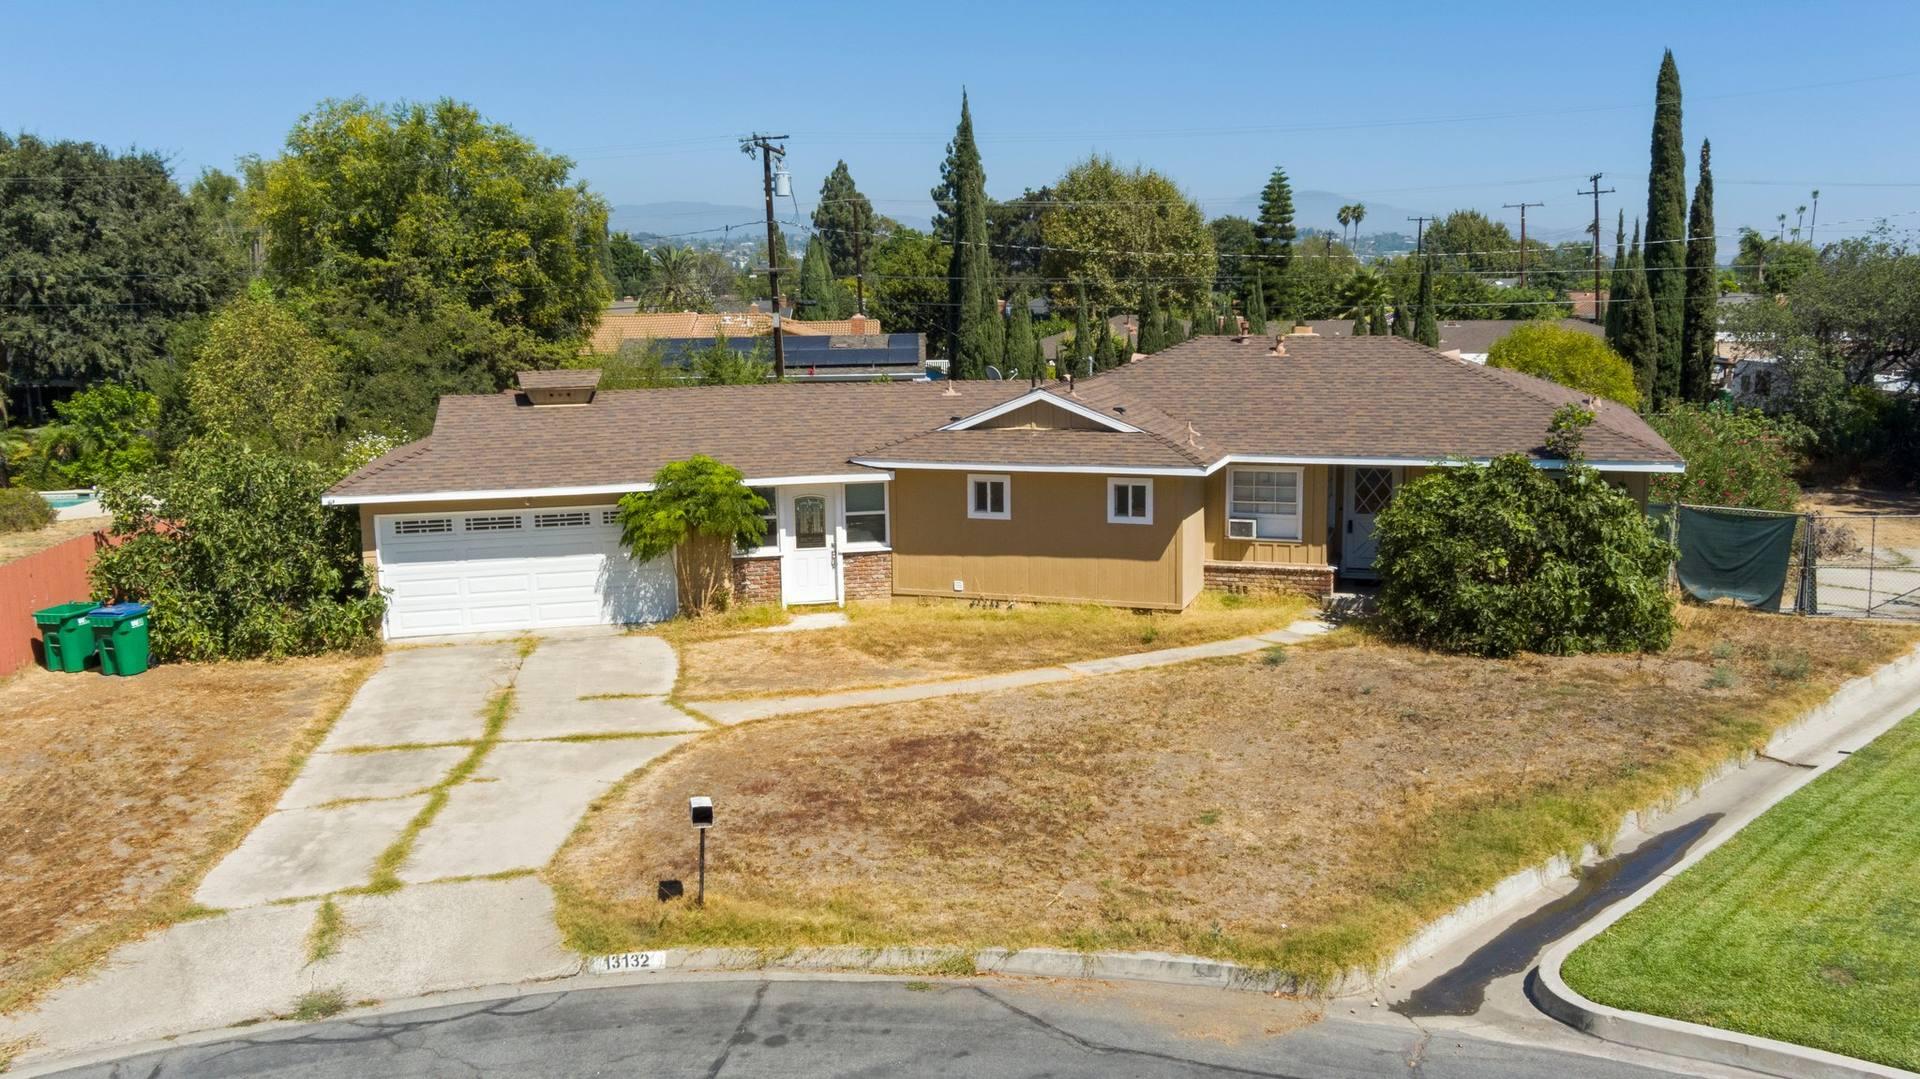 13132 Fairmont Way, Santa Ana, CA 92705, USA